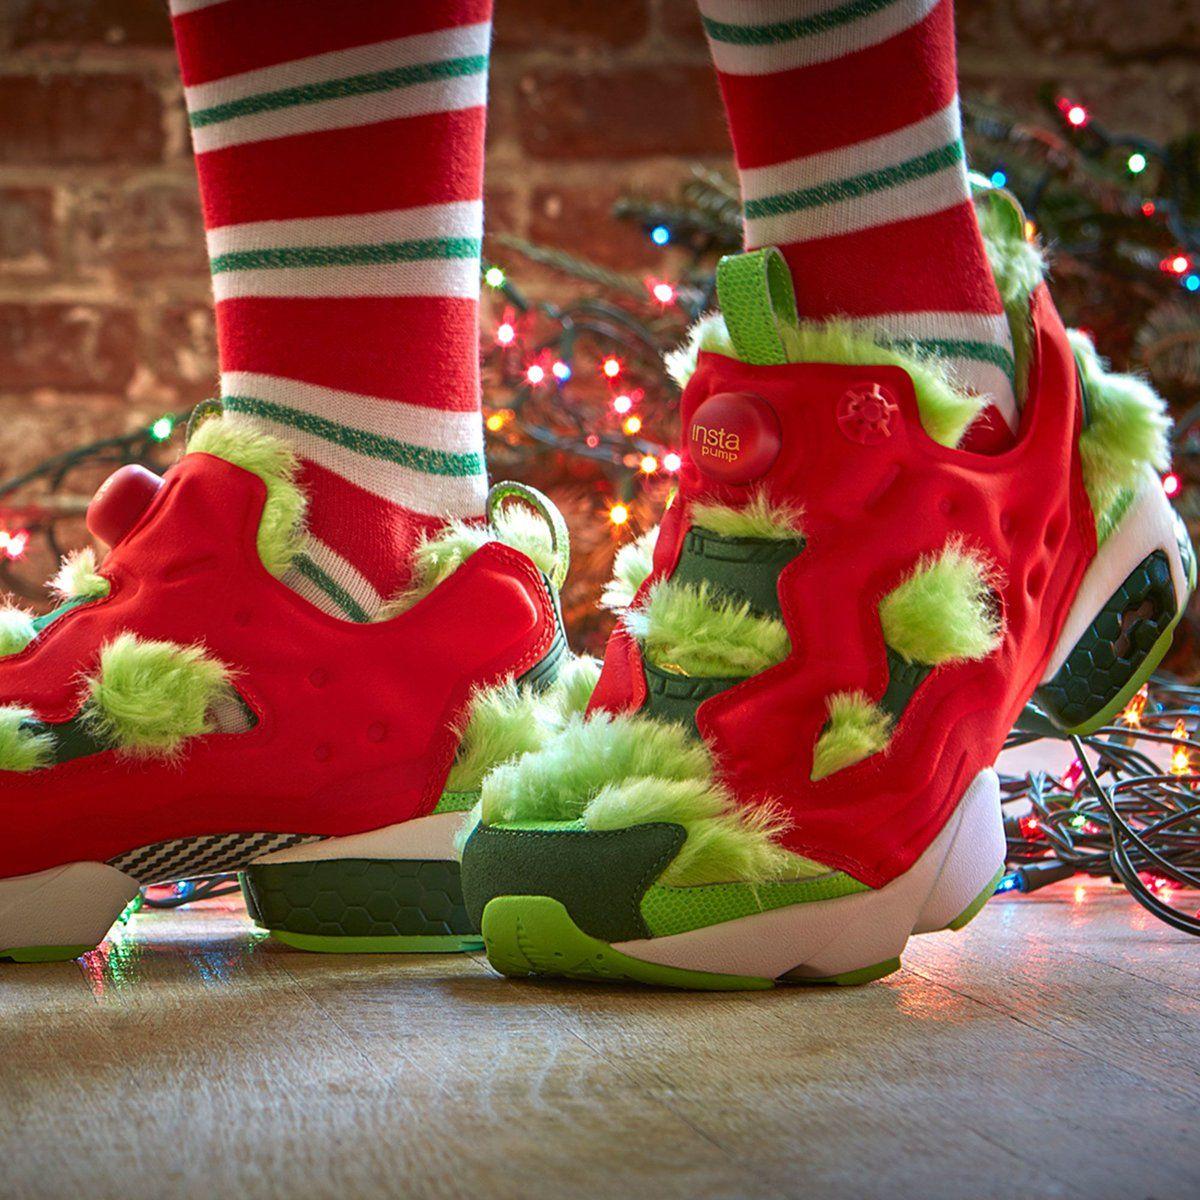 Reebok Sneakers Crazy Weird Strange Shoes Red Fluffy Fur Green Christmas  Nike Trainers Adidas Kicks a0b6d1472